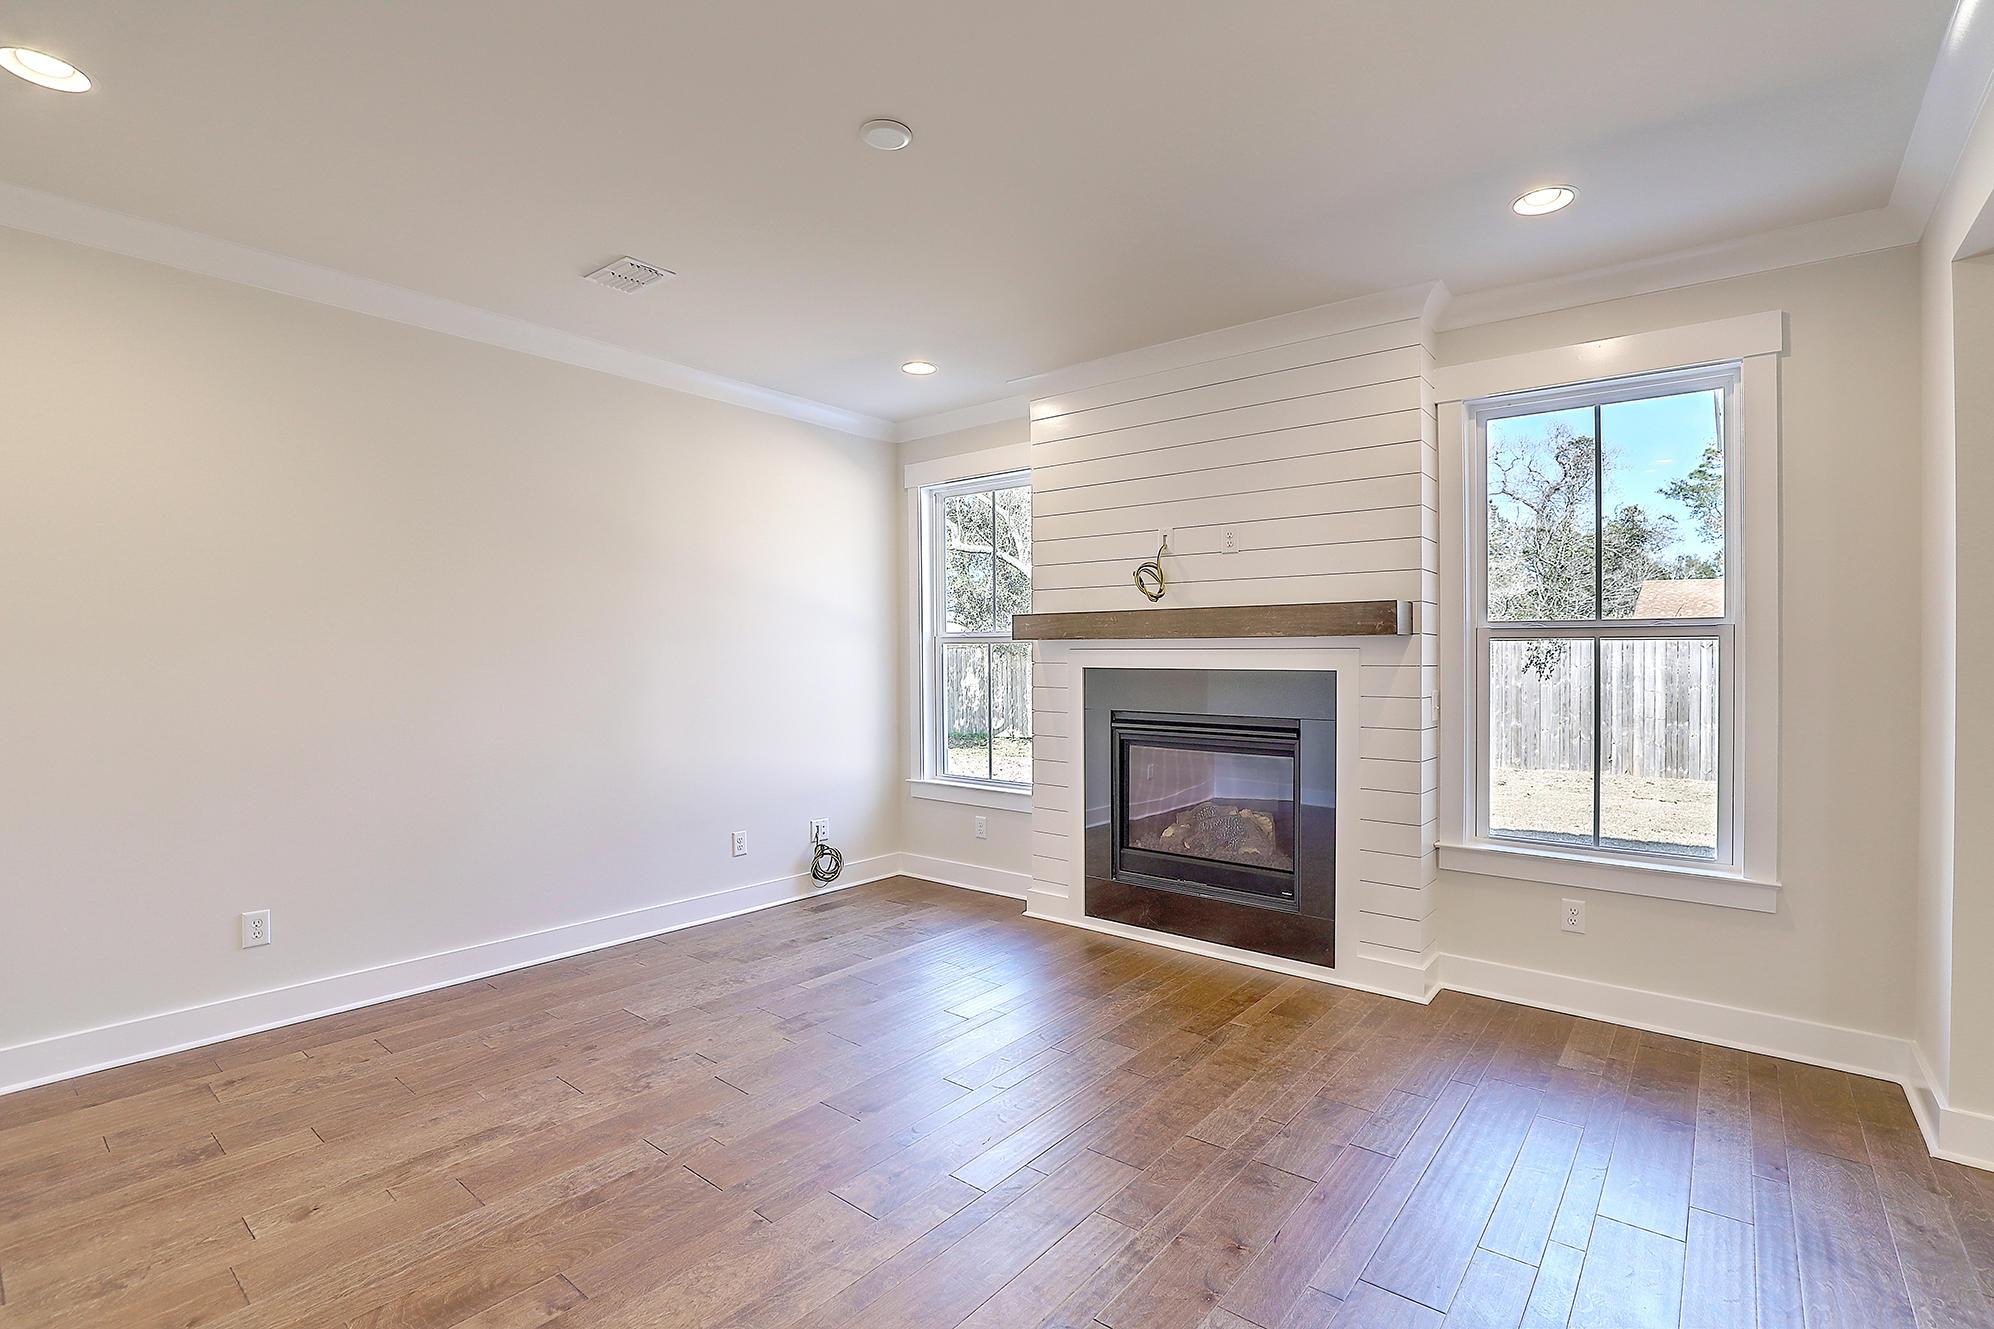 Bentley Park Homes For Sale - 1218 Gannett, Mount Pleasant, SC - 38